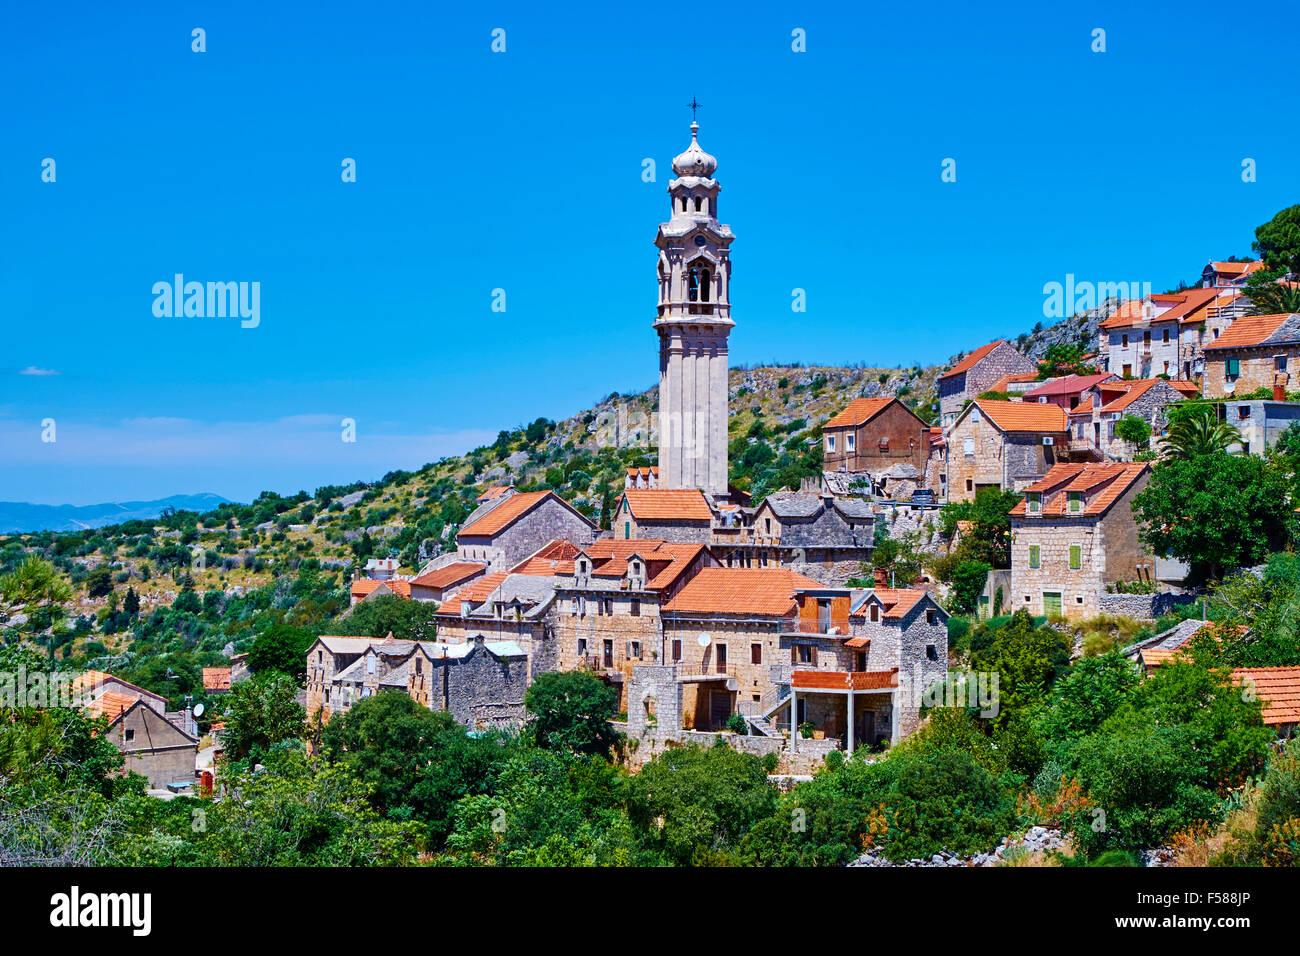 Croatia, Dalmatia, Brac island, Lozisca village, the most important campanile of the island - Stock Image